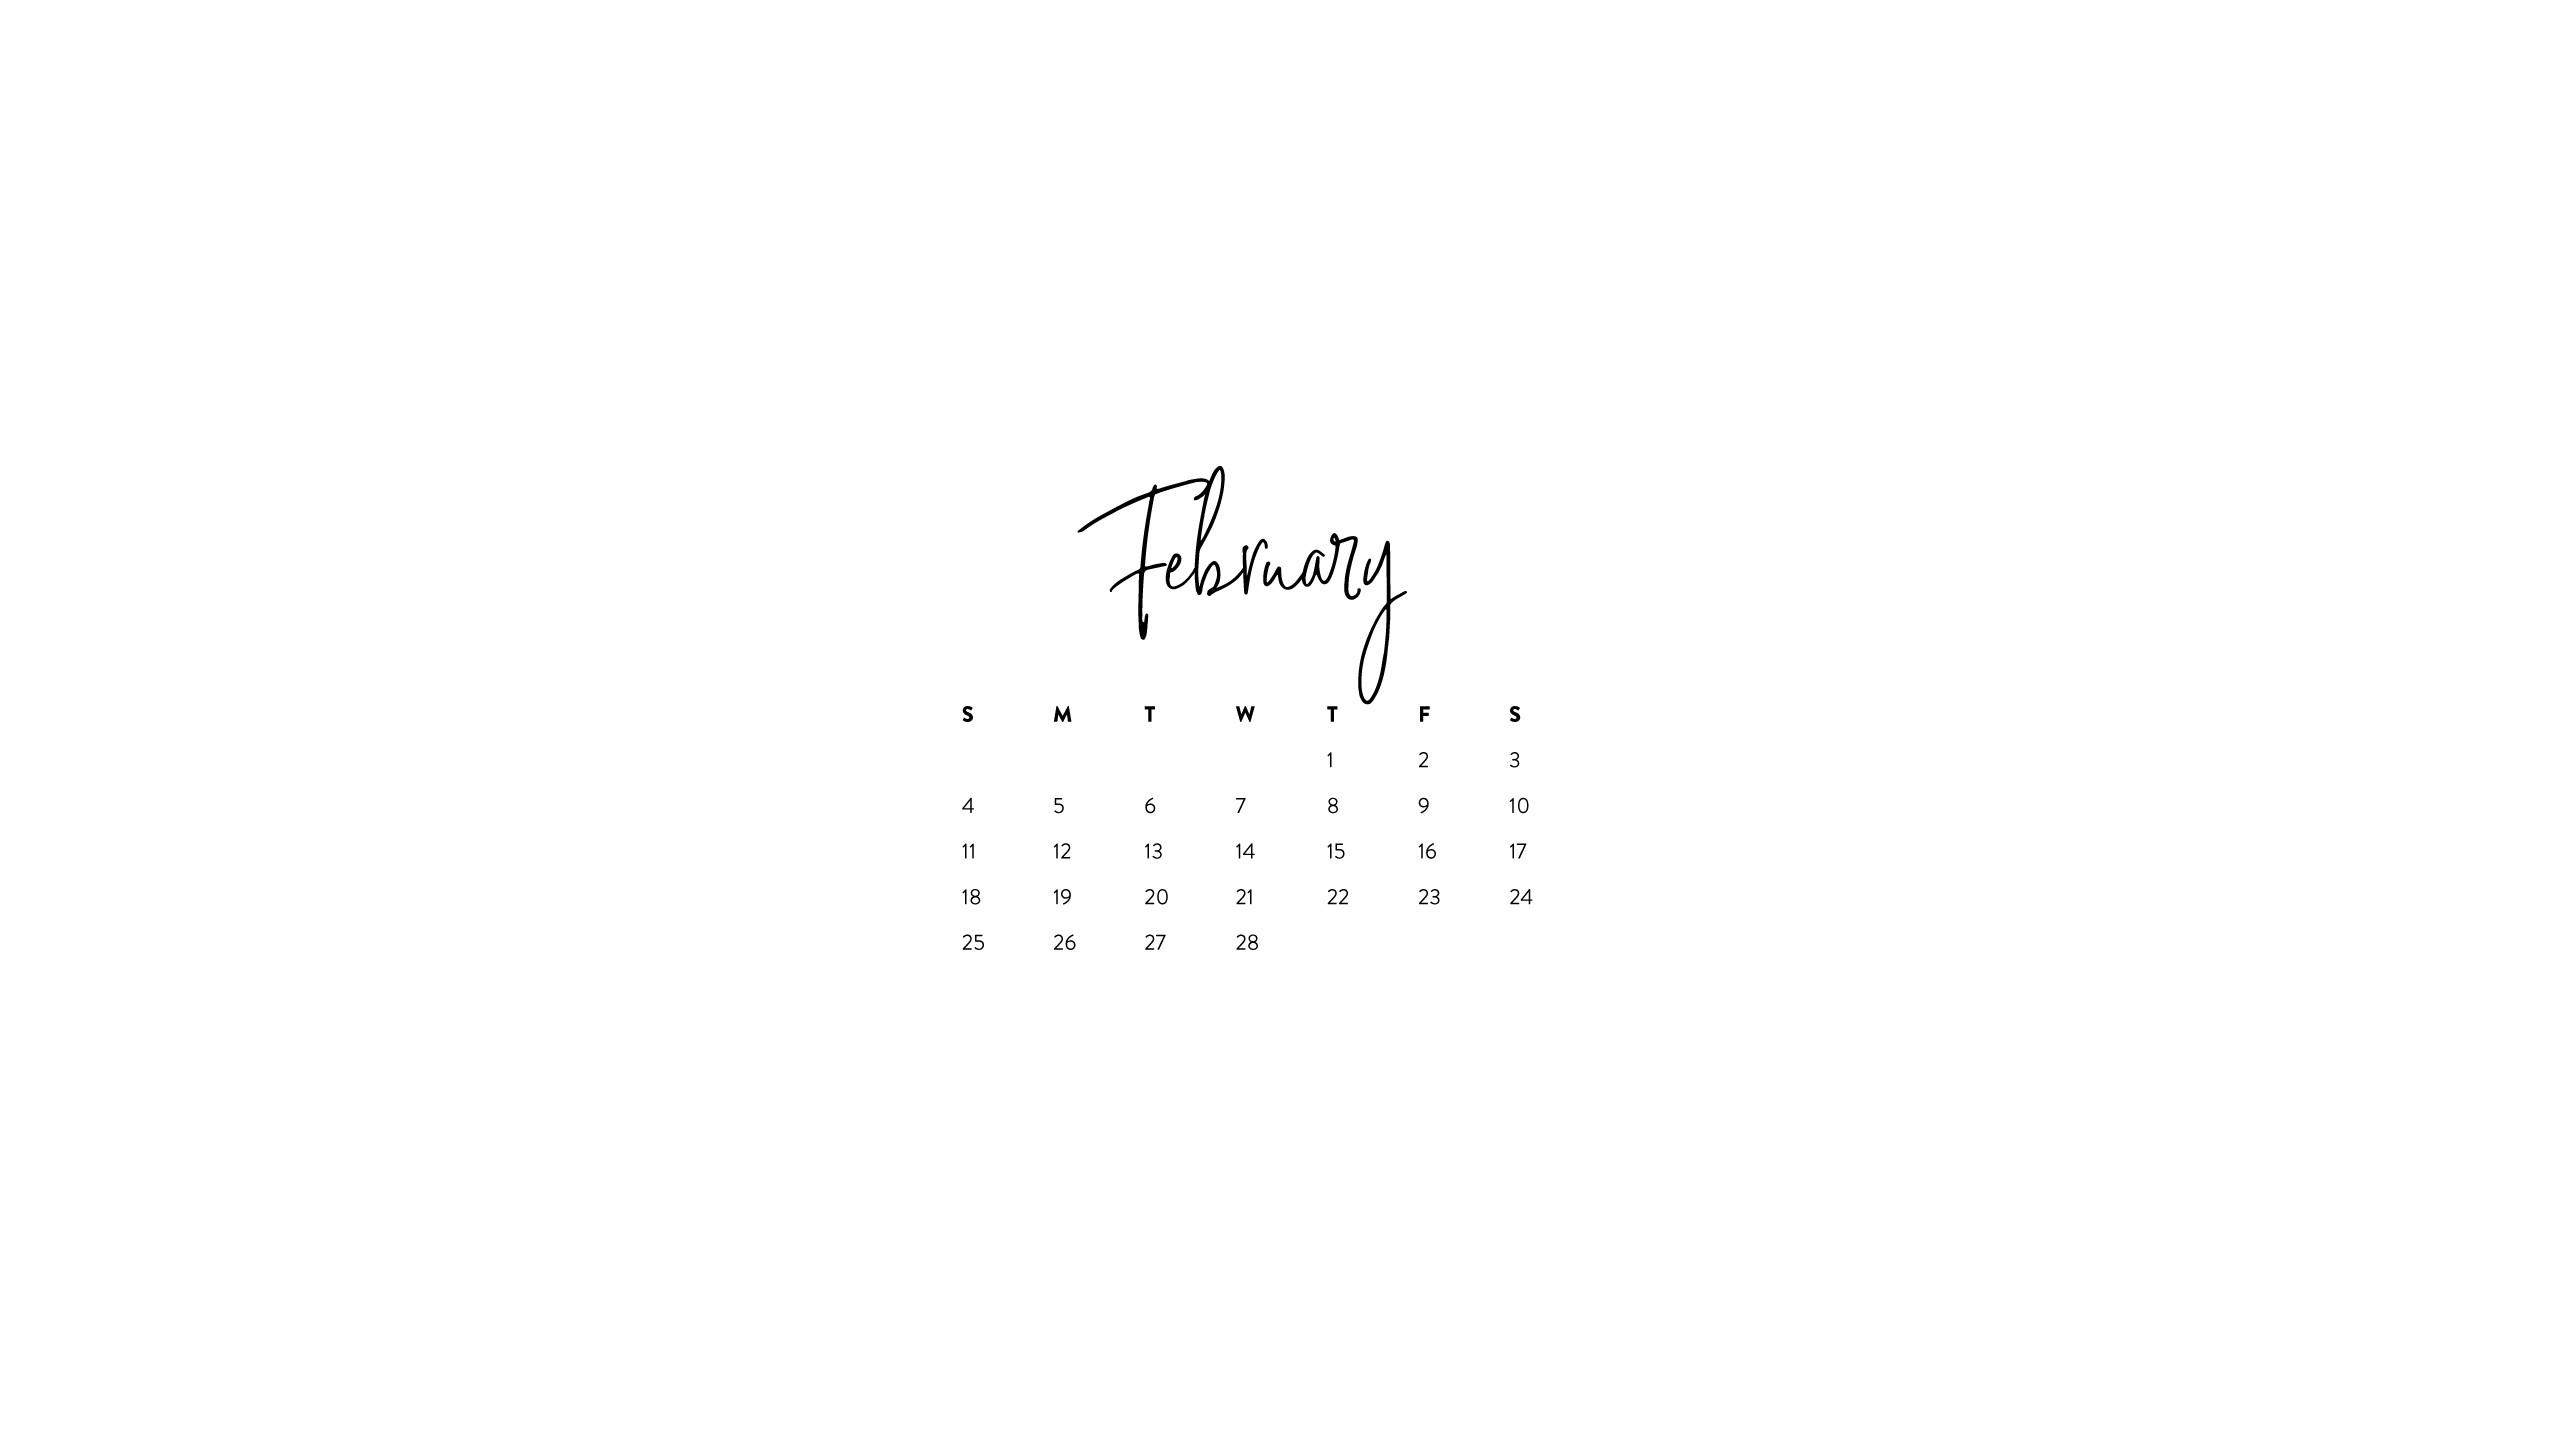 Desktop Wallpapers Calendar February 2018 70 Pictures